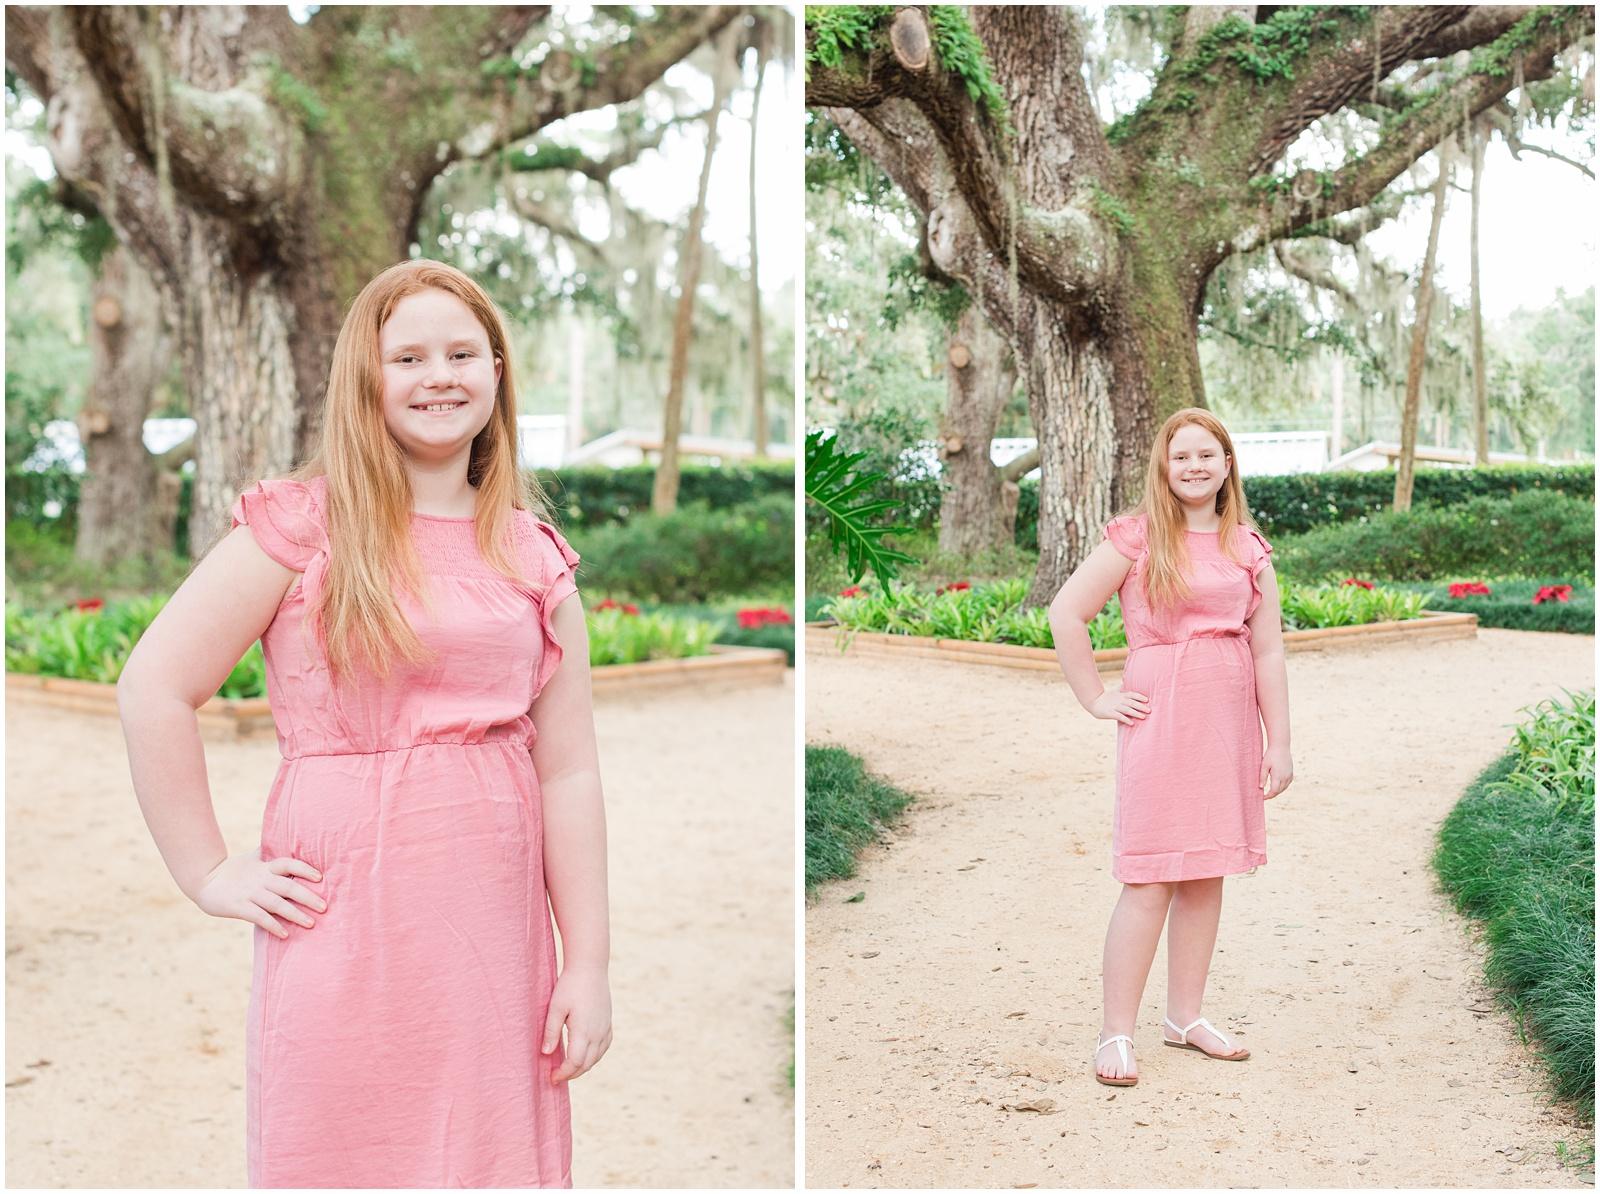 Washington Oaks_Garden_State Park_Beach_Family_Portraits_4.jpg